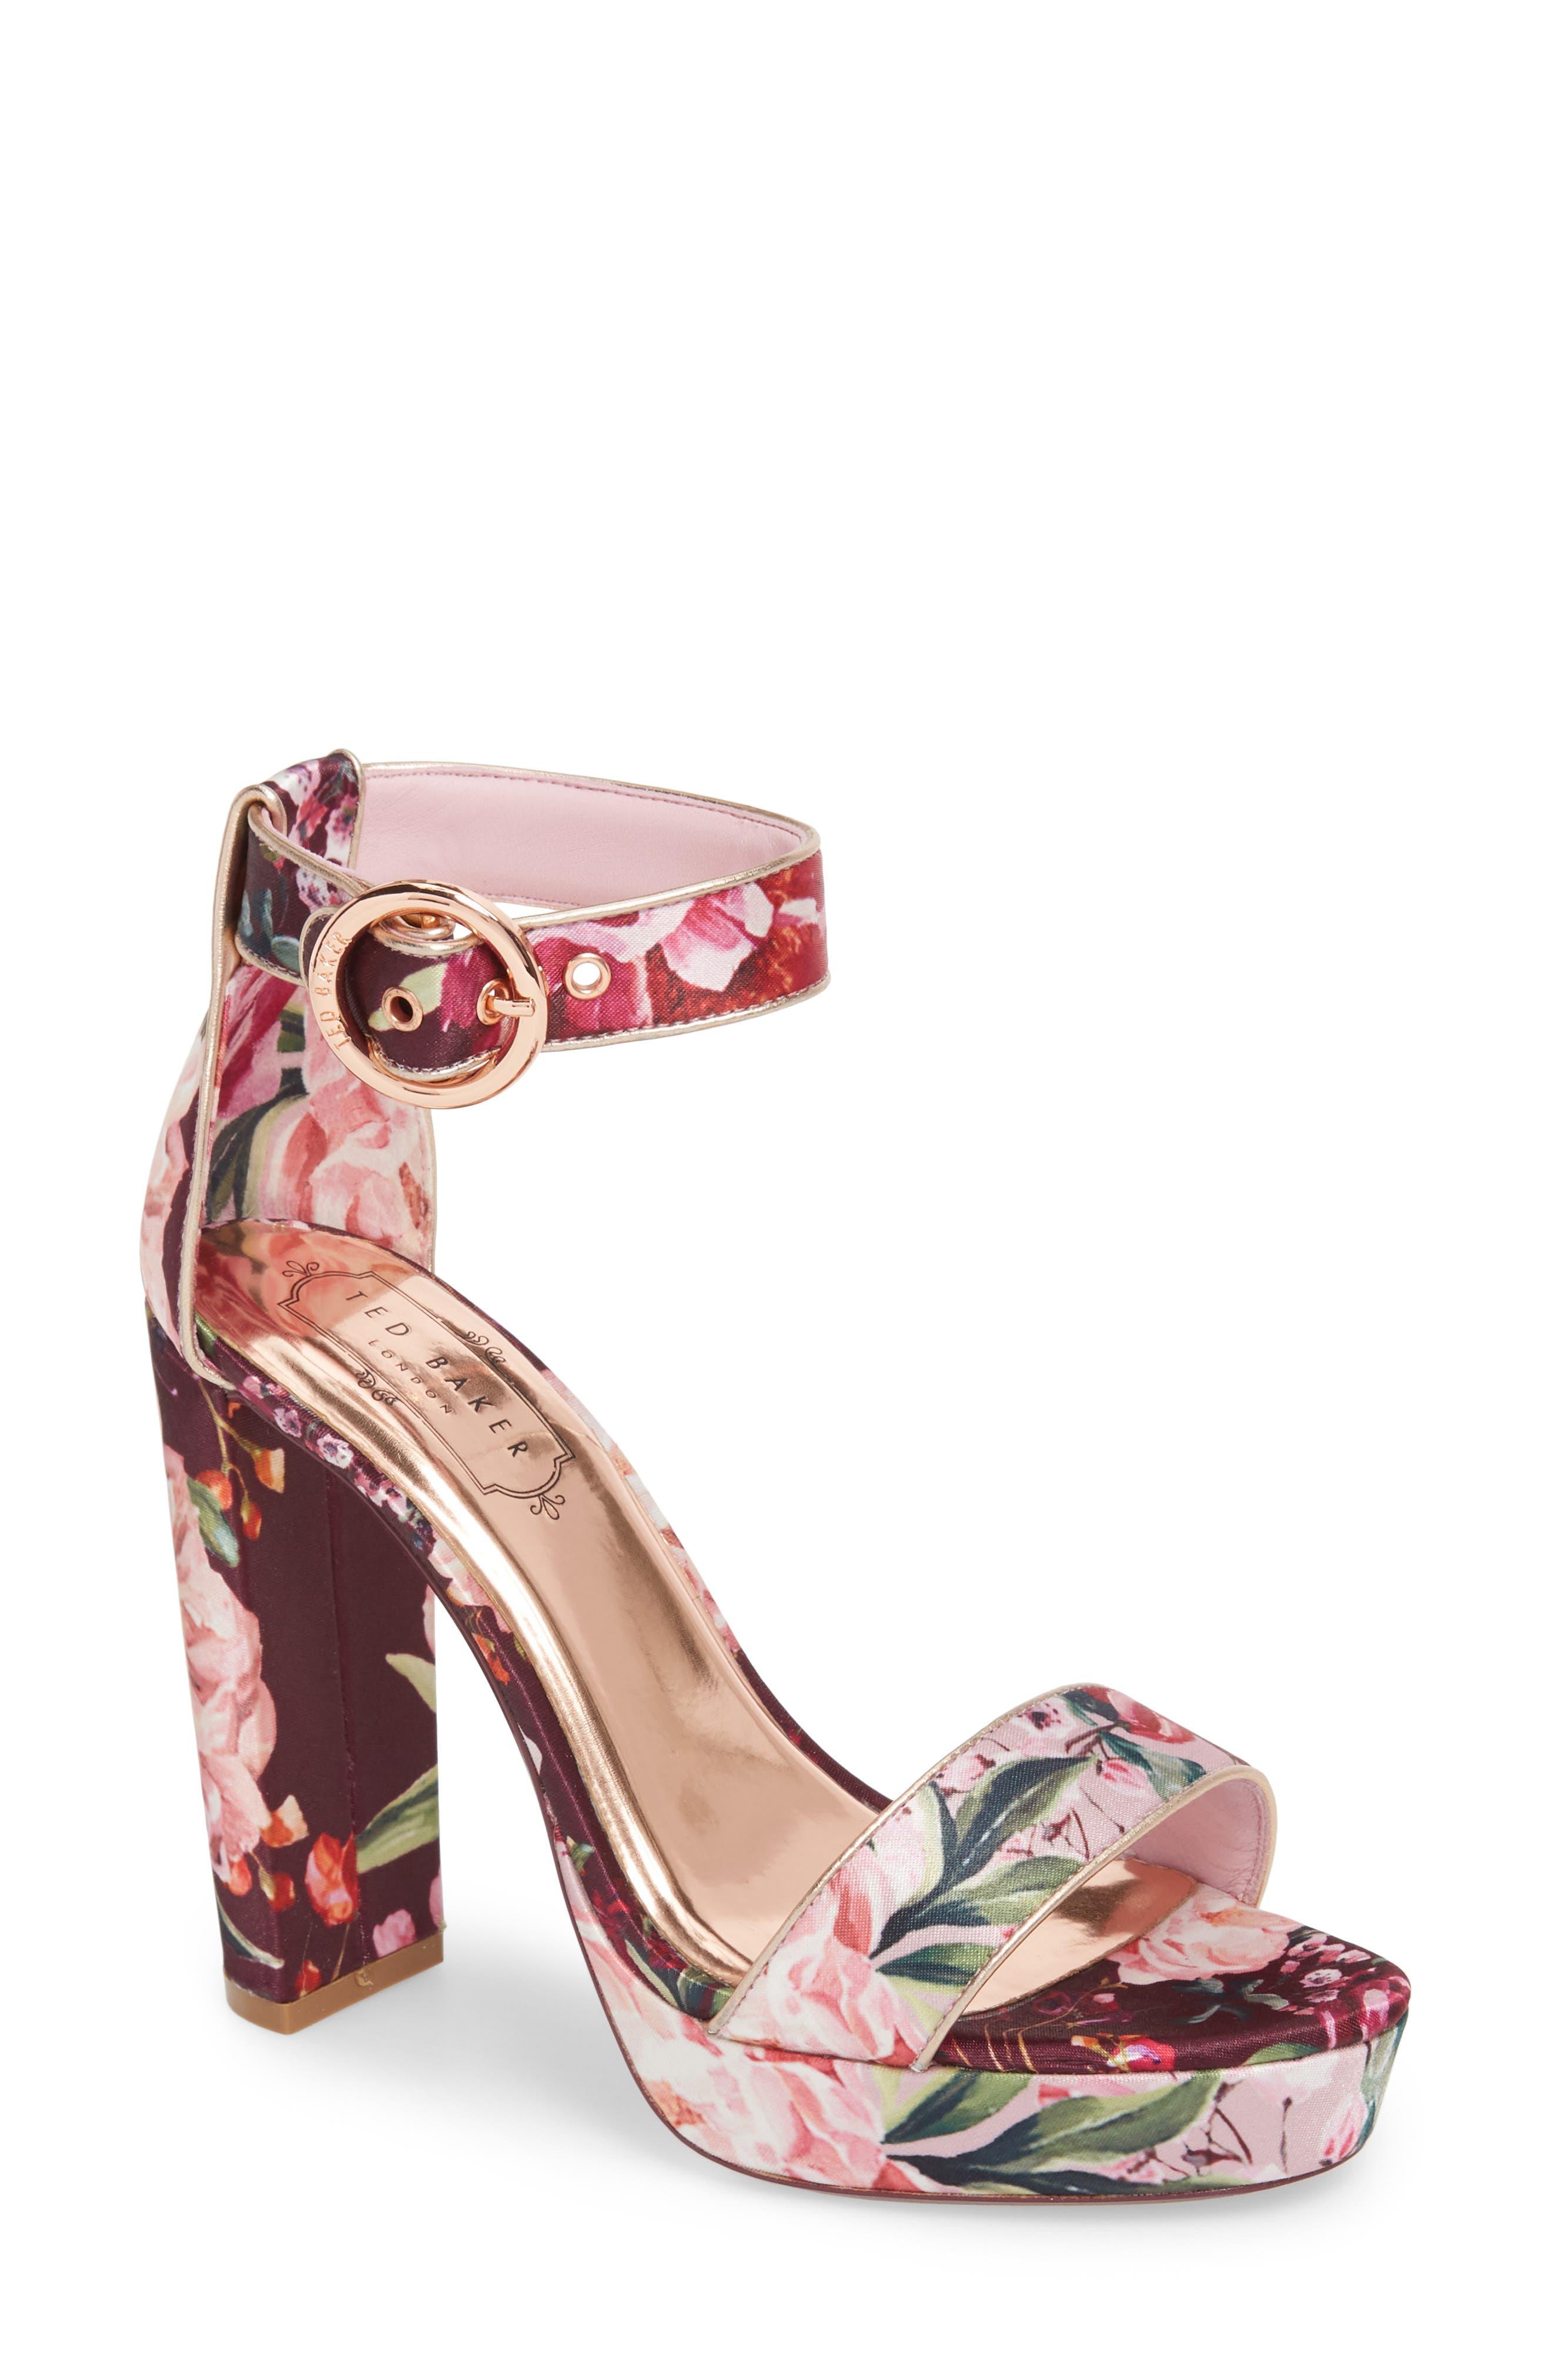 Jewll Ankle Strap Sandal,                         Main,                         color, Serenity Satin